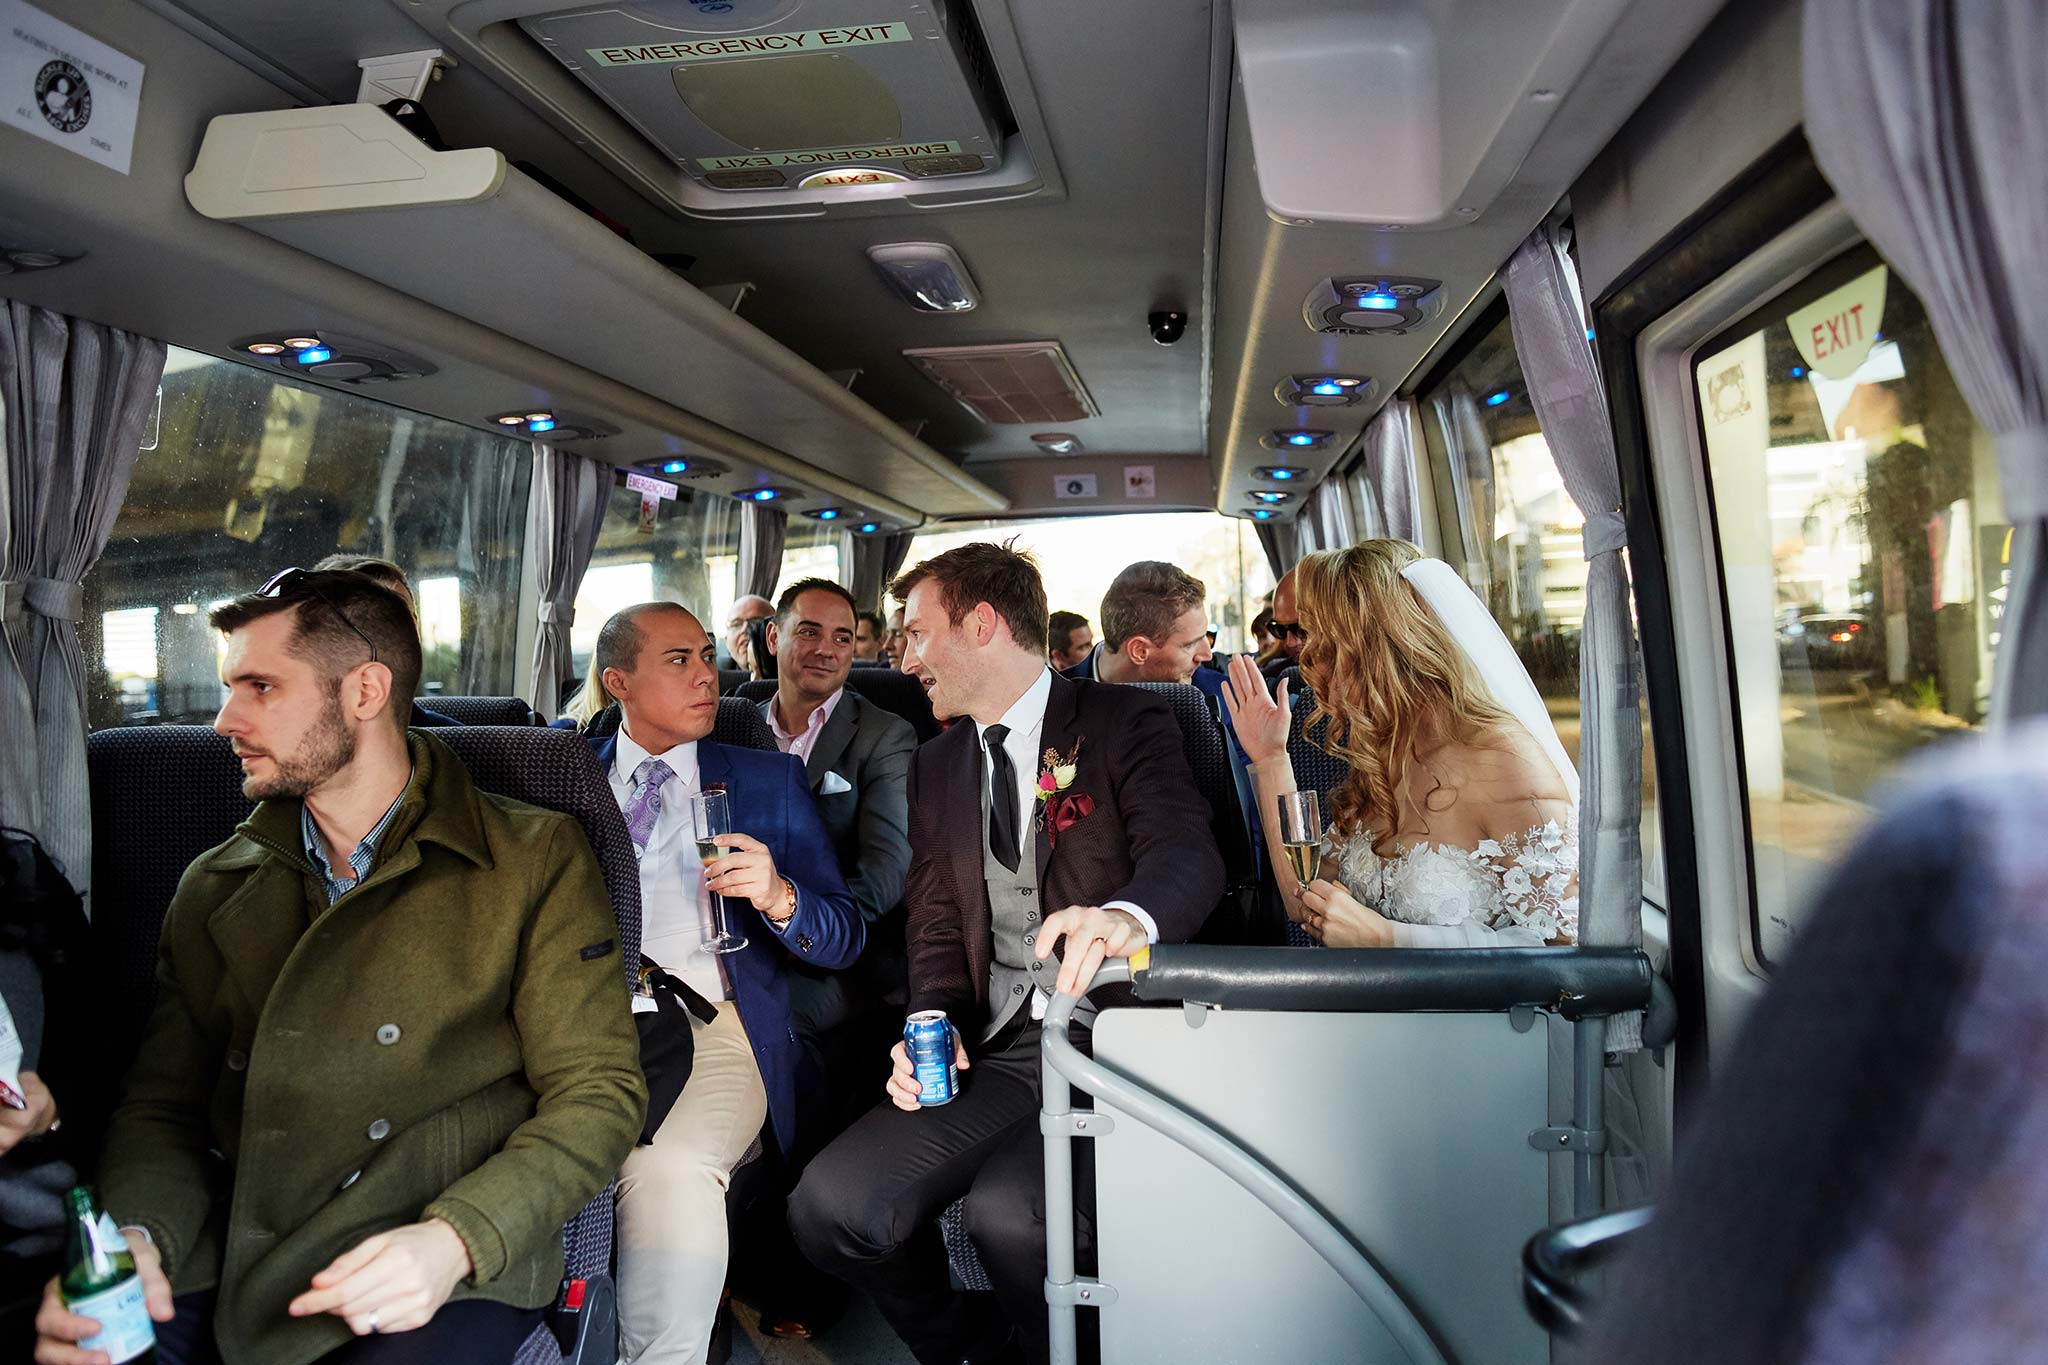 Melbourne-tour-bus-wedding-photographer